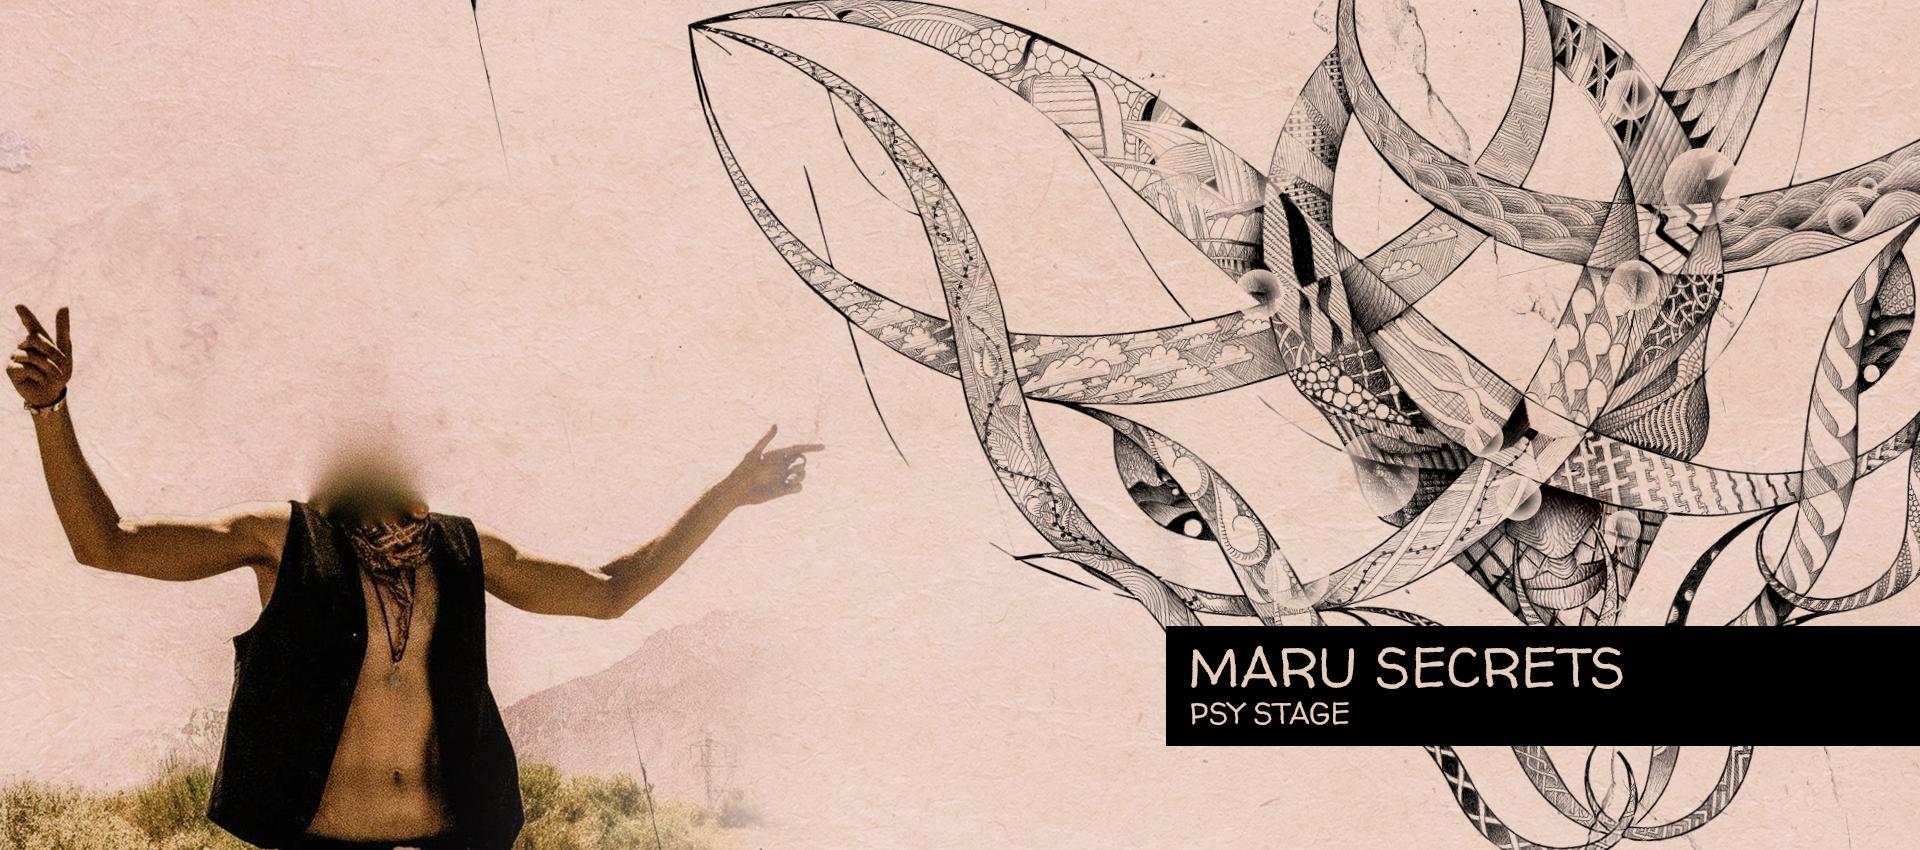 Maru Secrets